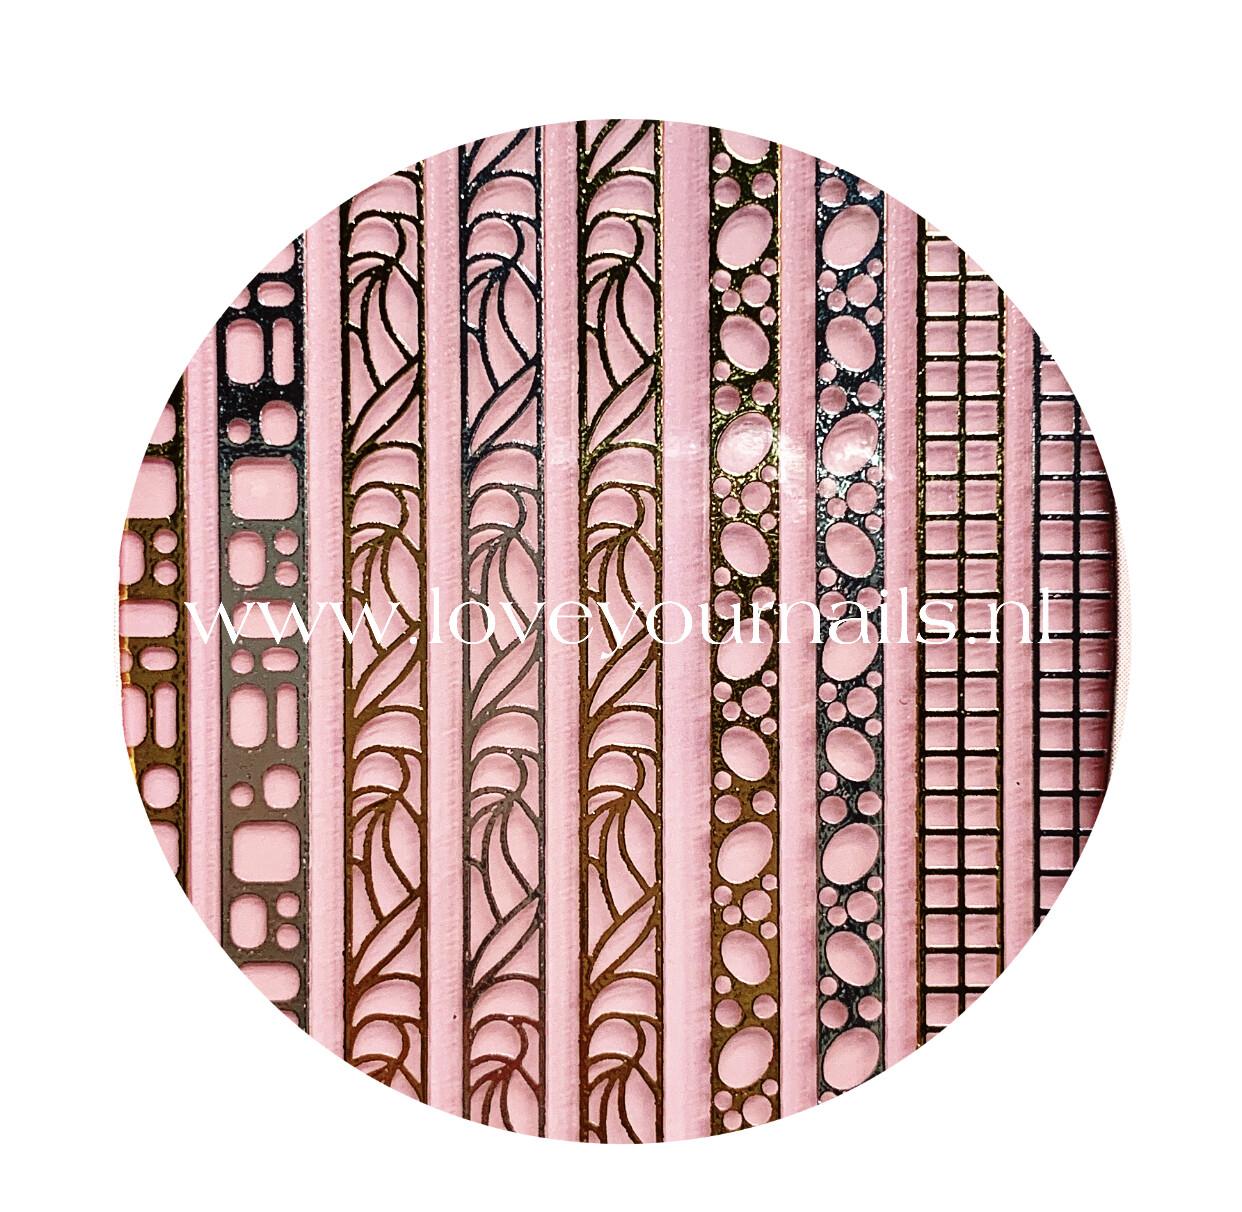 Charmicon Silicone Stickers Jewelry Gold/Silver #3